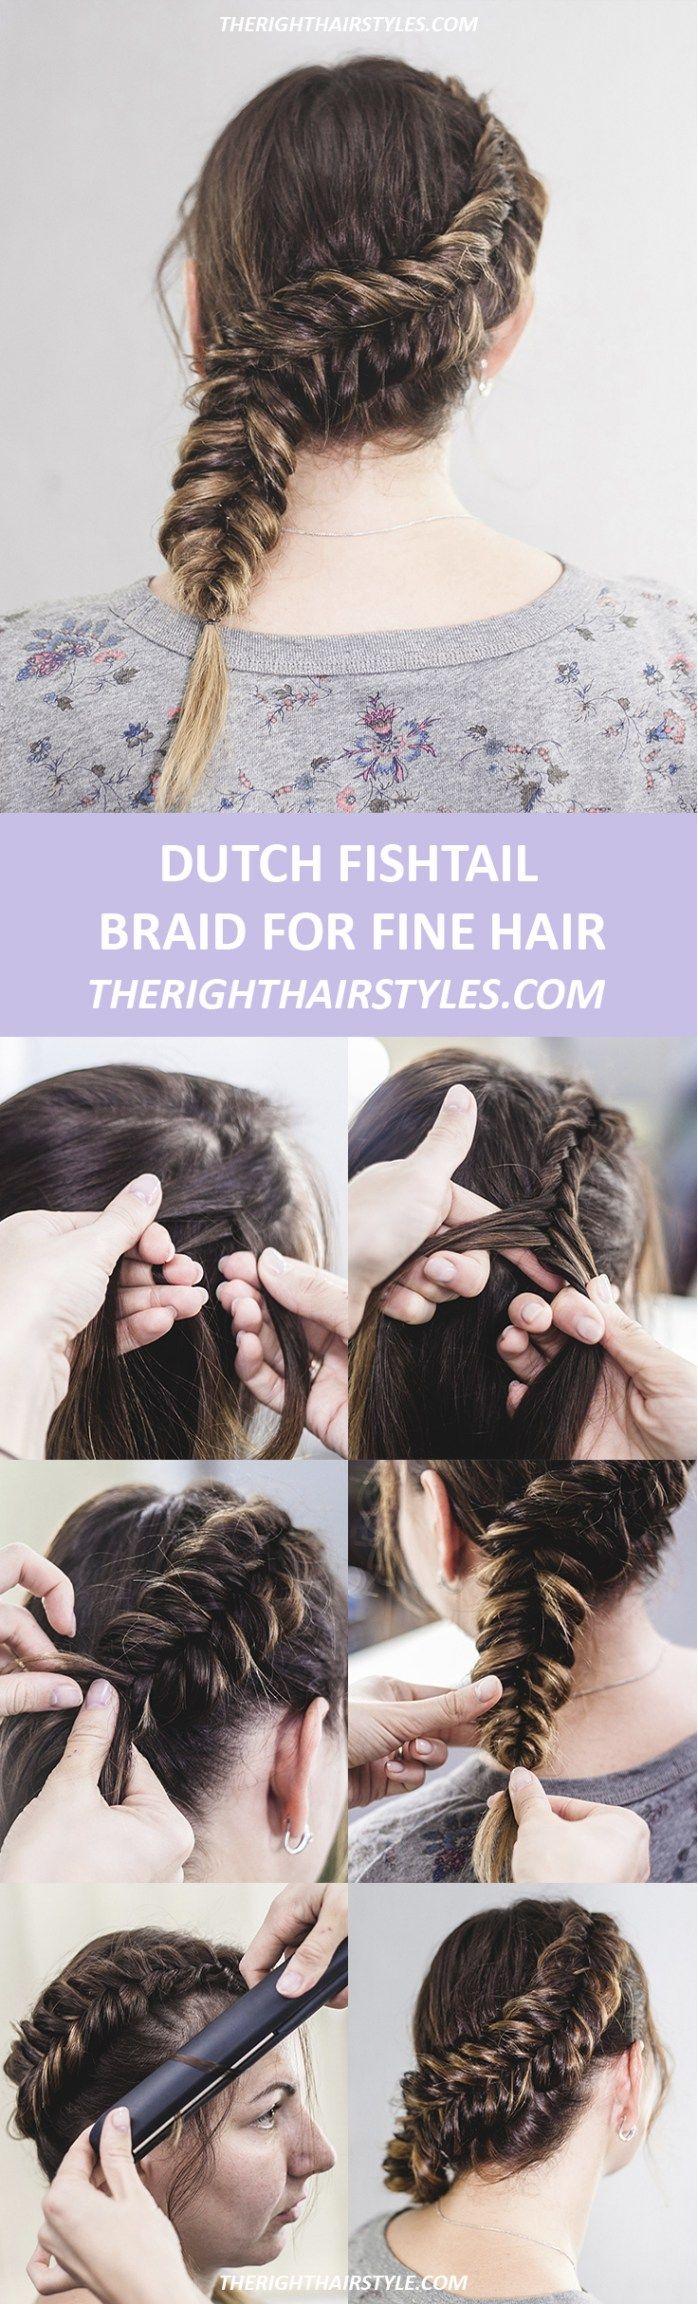 How To Make A Dutch Fishtail Braid In 5 Easy Steps In 2020 Dutch